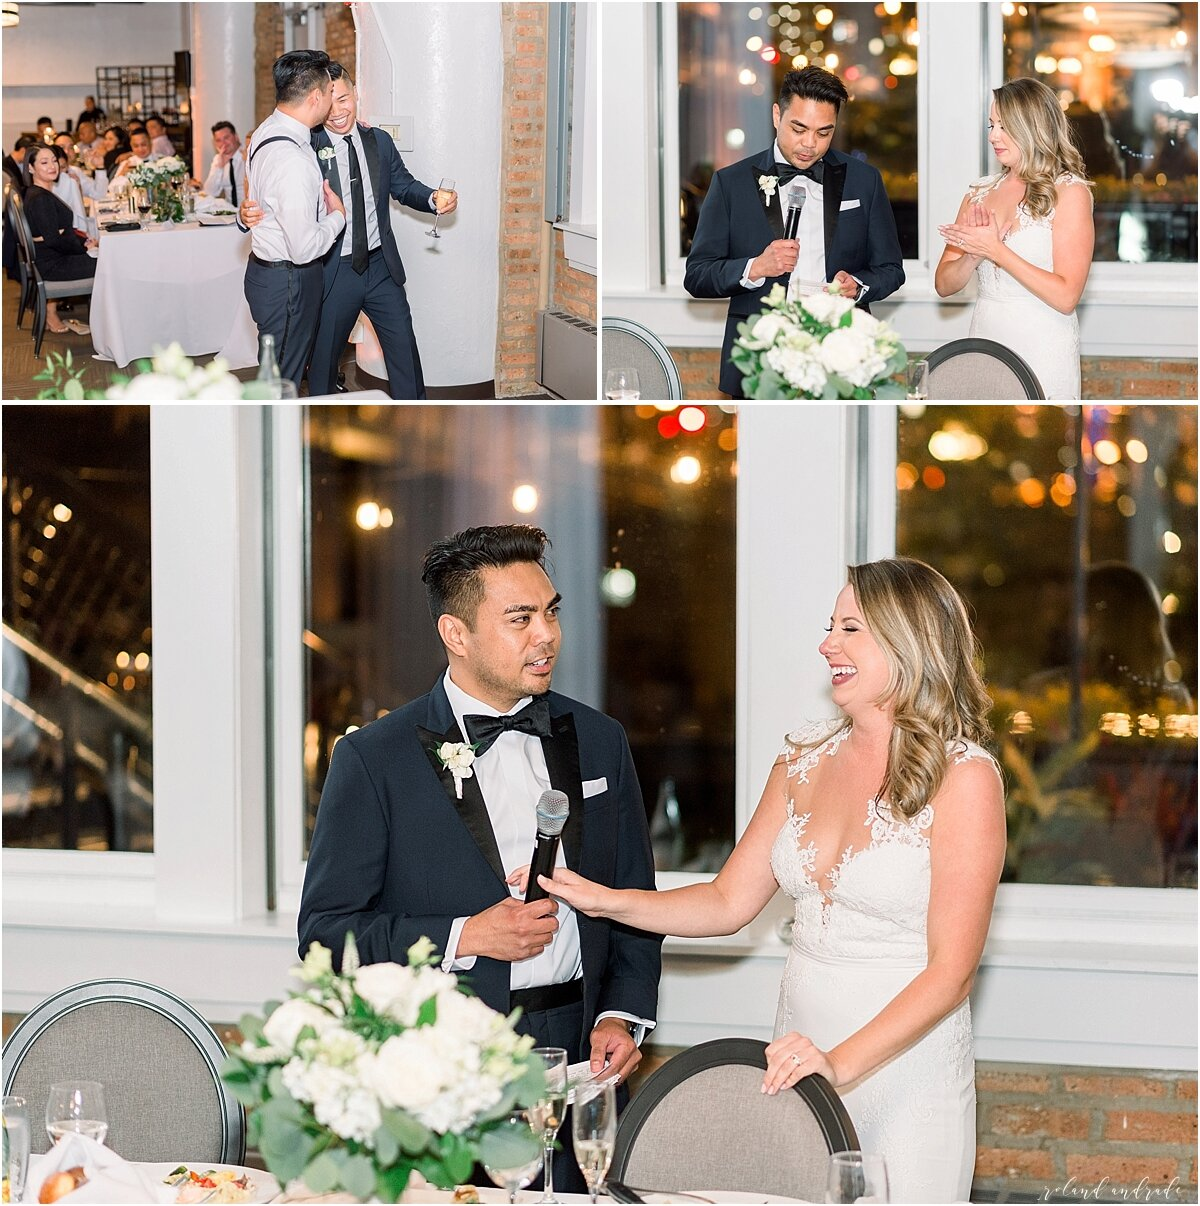 River Roast Wedding + Light and Airy Wedding Photographer Chicago + renaissance Hotel Wedding Photographer + Chicago Photography + Naperville Wedding Photographer + Chicago Engagement Photographer + Best Photographer In Chicago_0074.jpg